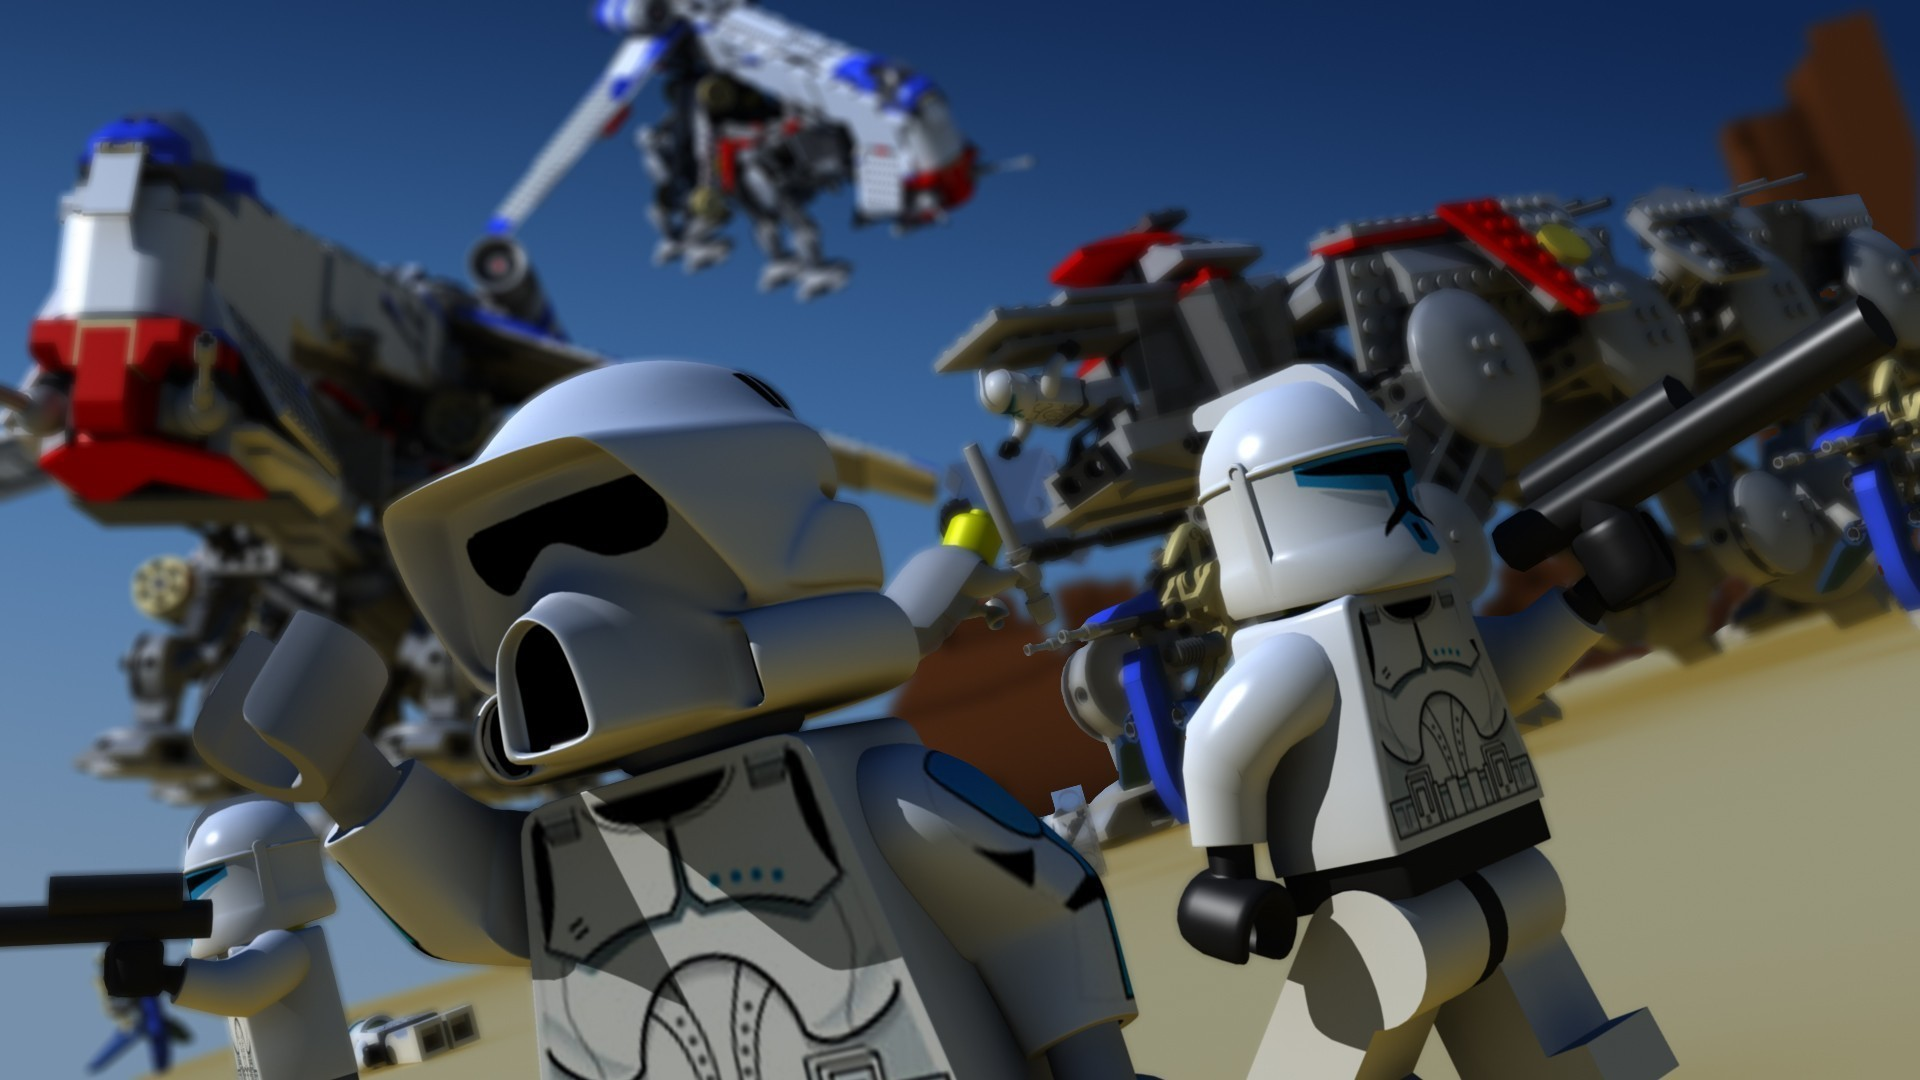 Lego star wars wallpaper 69 images - Lego star warse ...